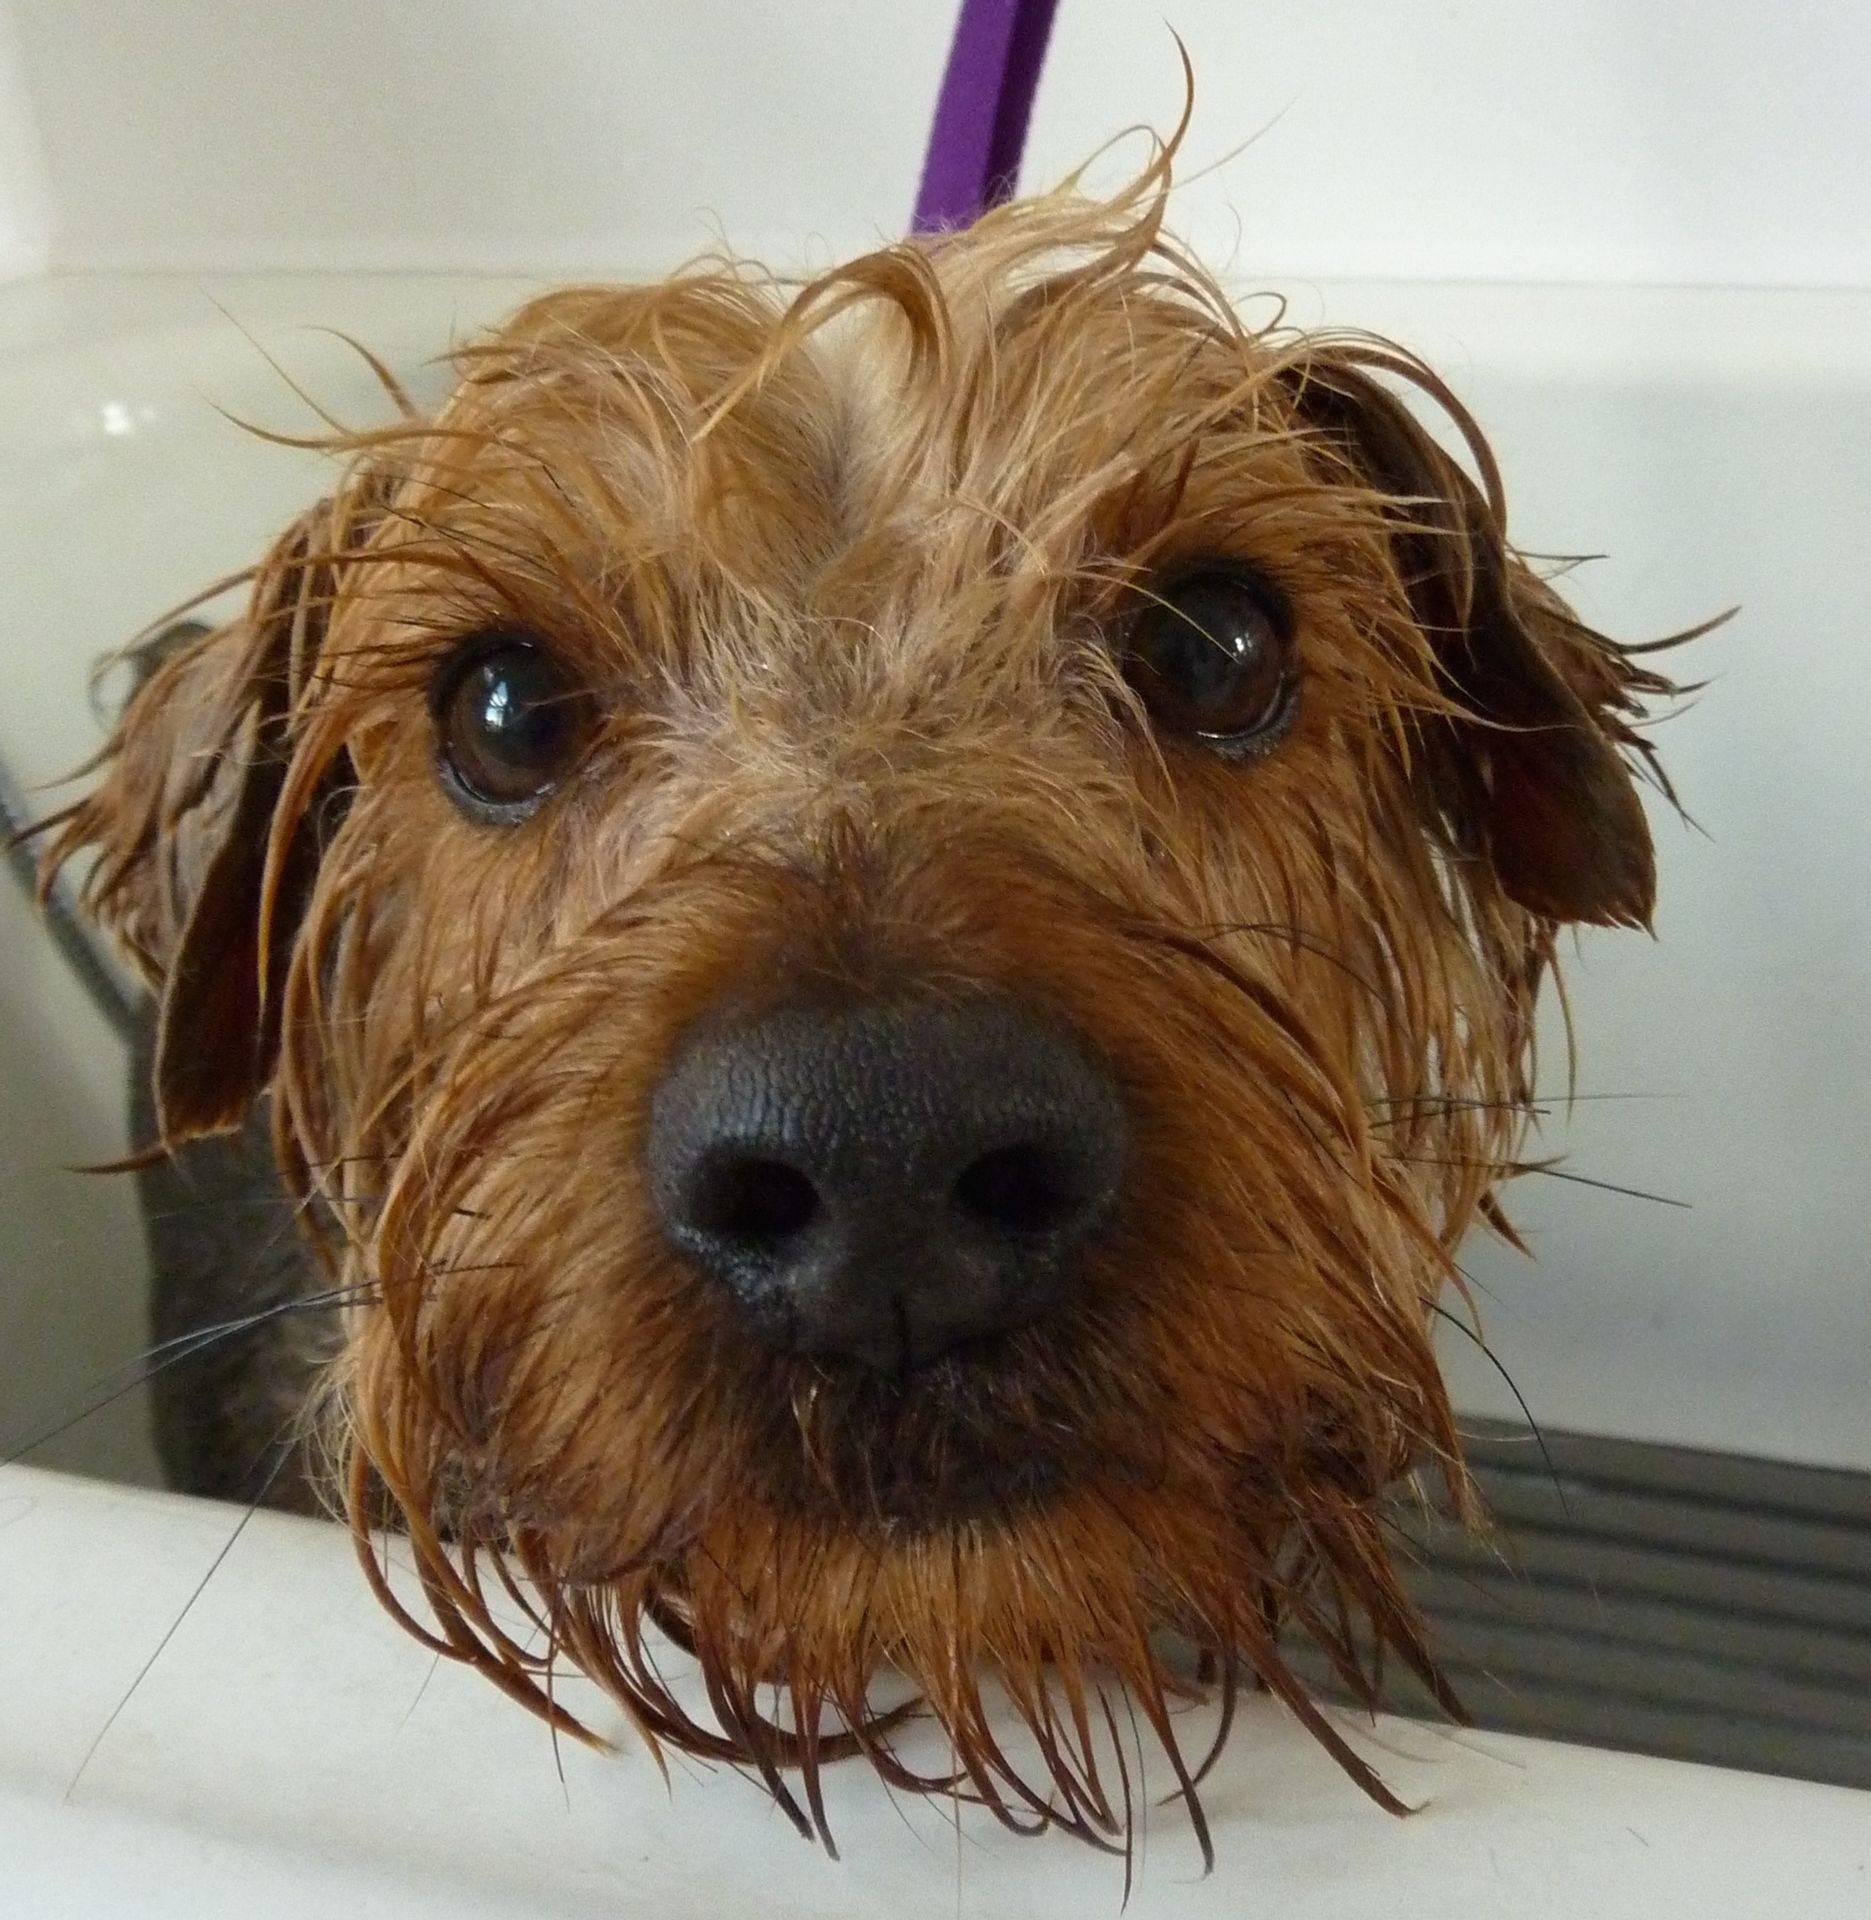 Alfie - Yorkshire Terrier x. Bath time!